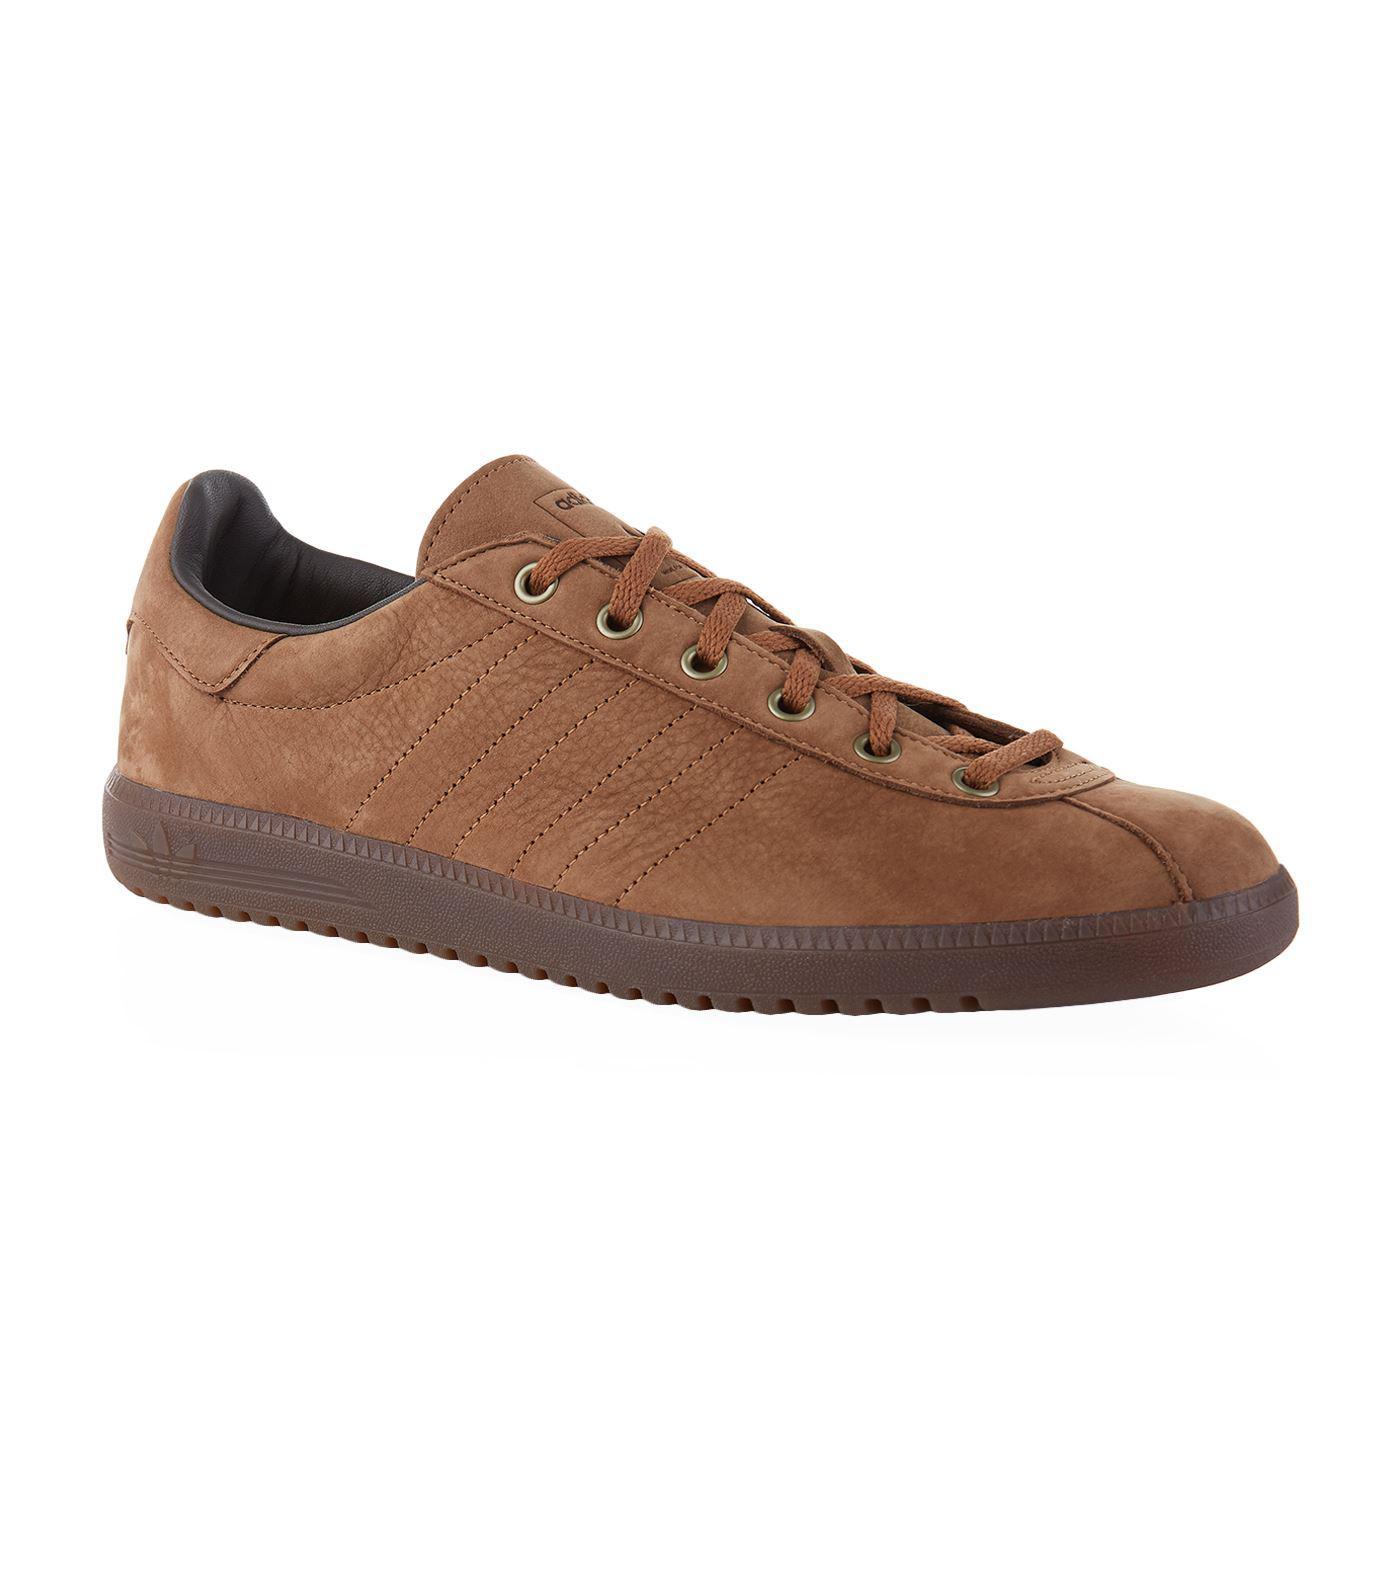 les chaussures de sport adidas adipure base flex vert noir / choc